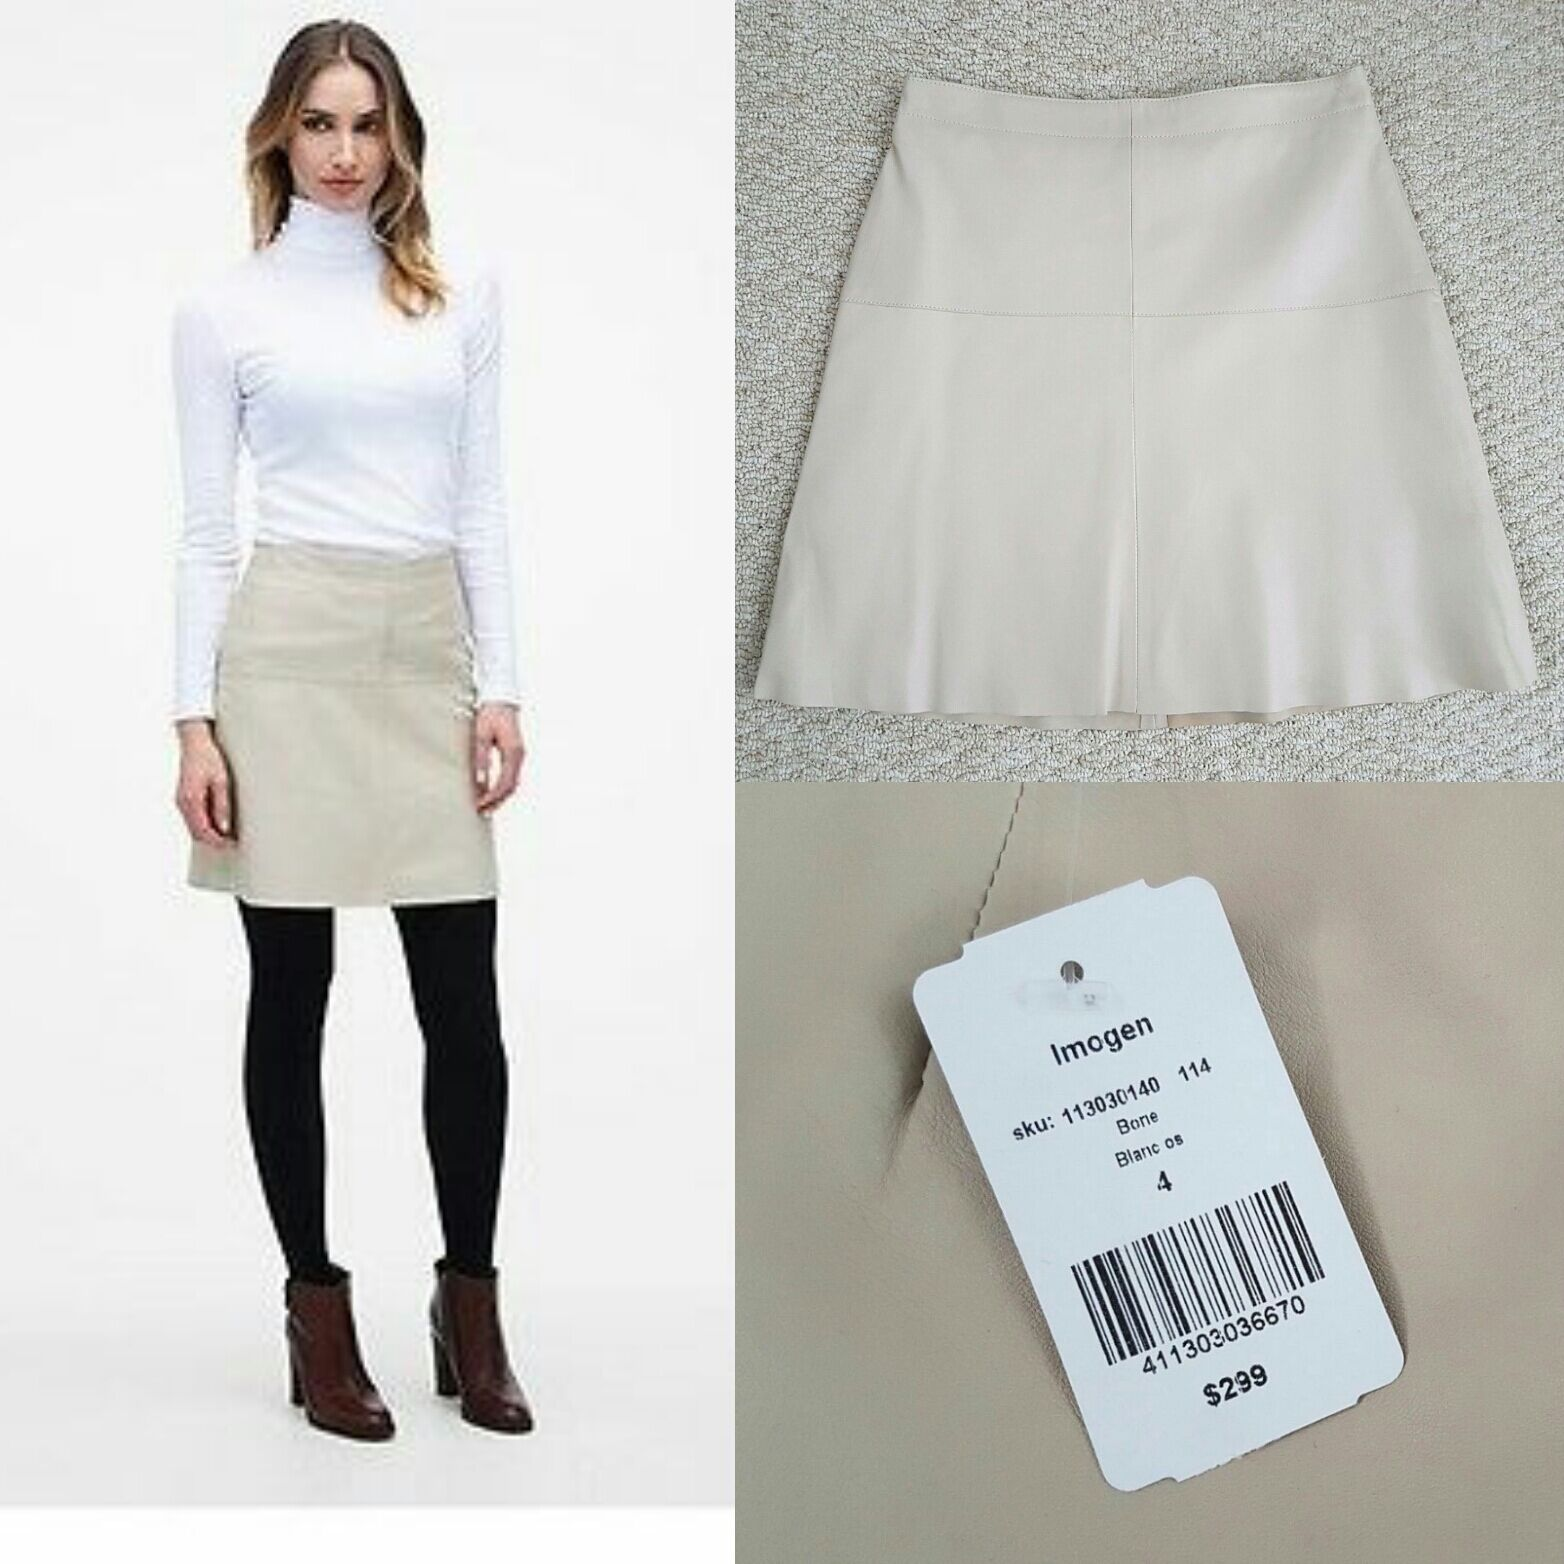 NWT Danier genuine lamb leather bone cream skirt size 4 (fits XS, S)  299